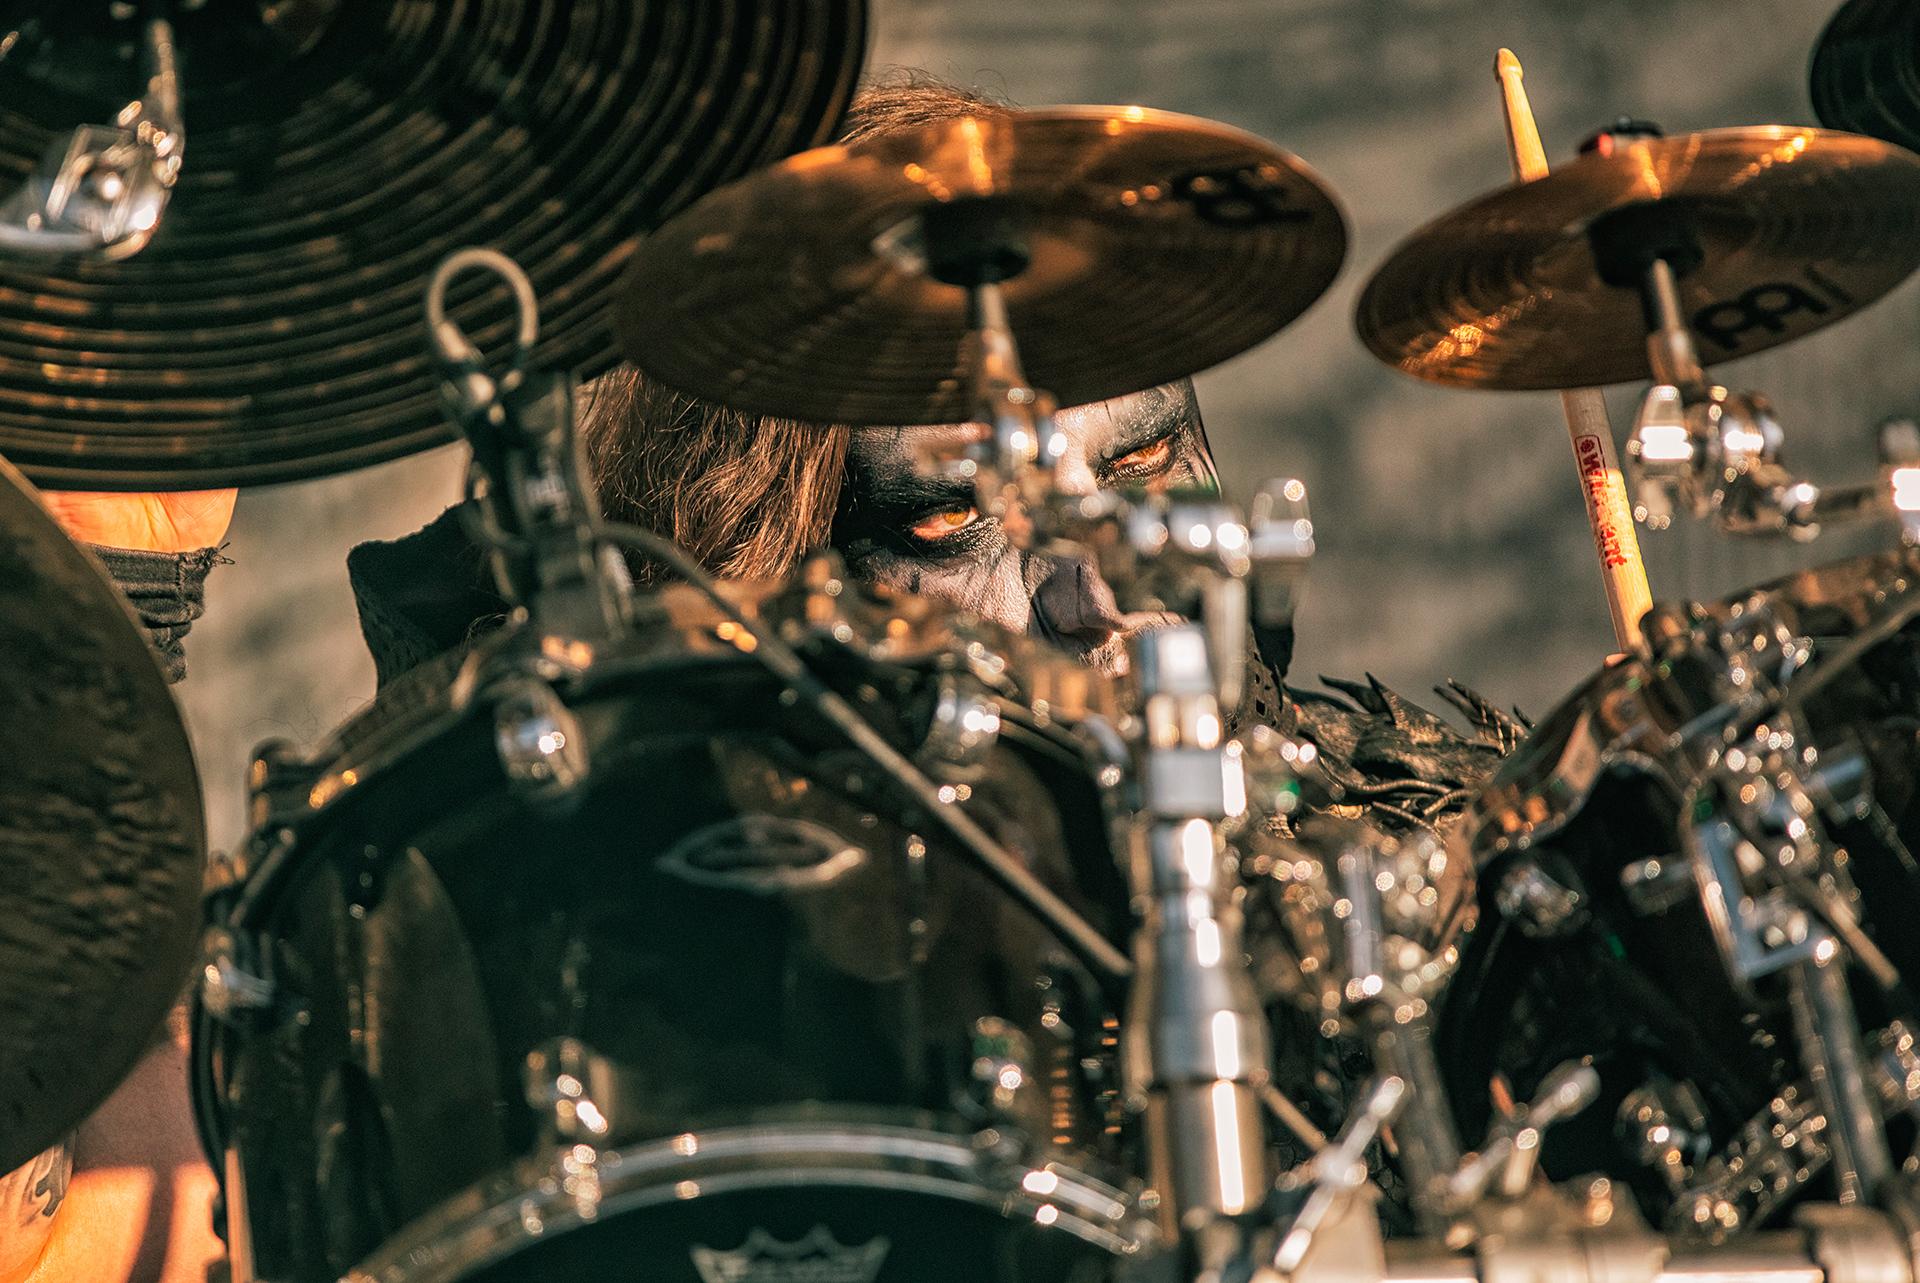 Dariusz Daray Brzozowski, Dimmu Borgir band, drummer, Tuska metal festival